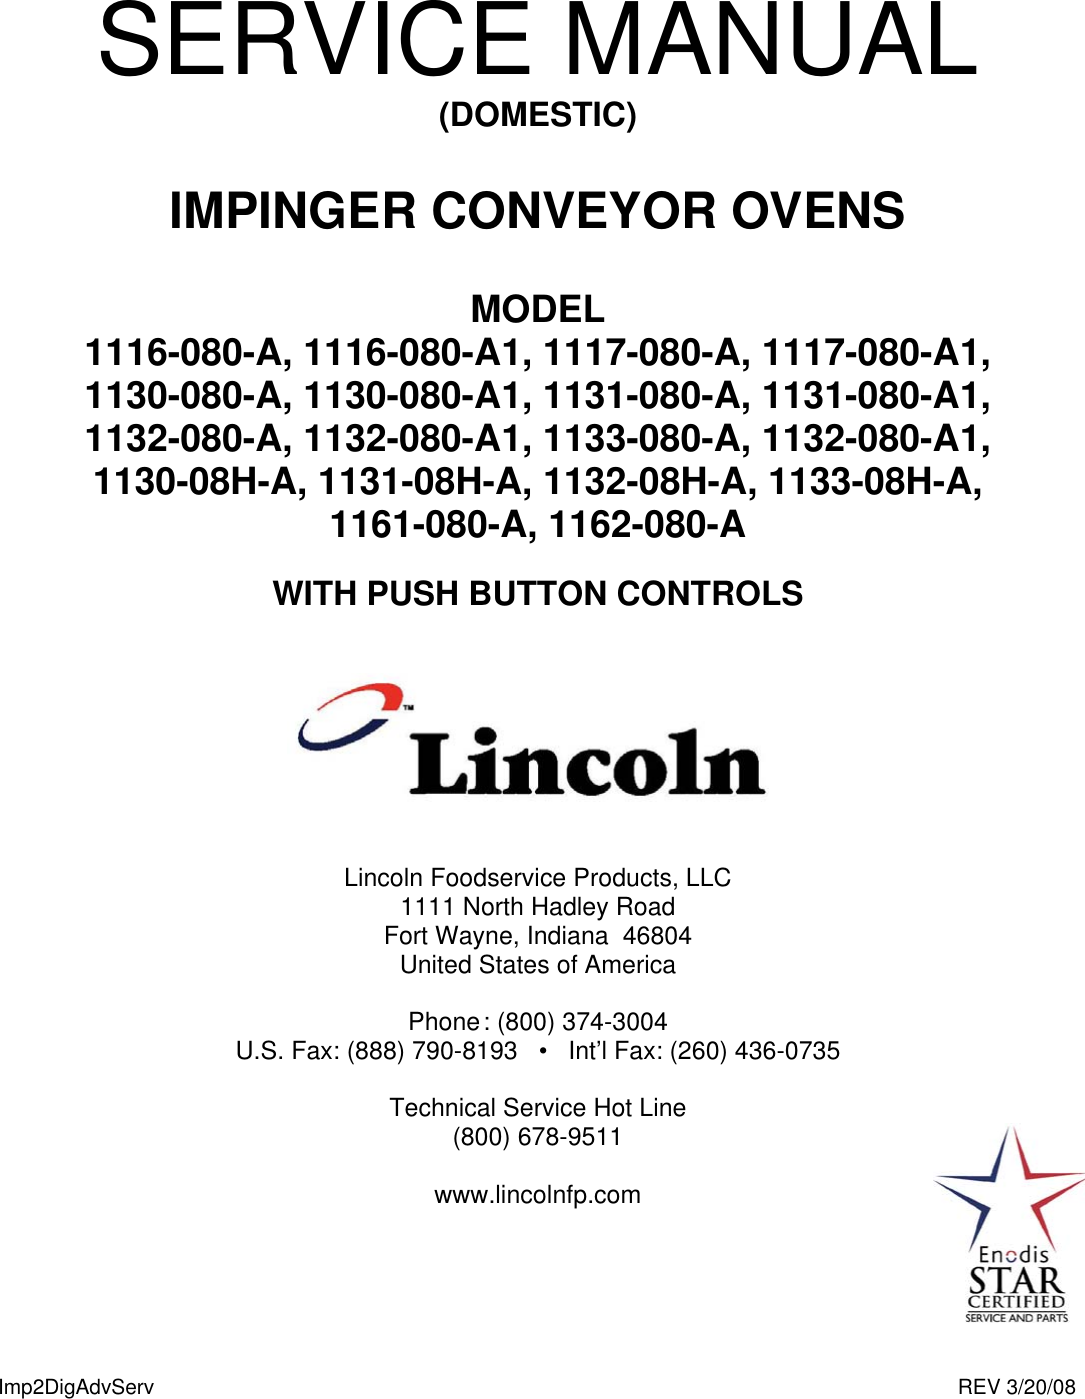 Lincoln 1116 080 A Users Manual Impinger II Advantage Digital Express Service Domestic2